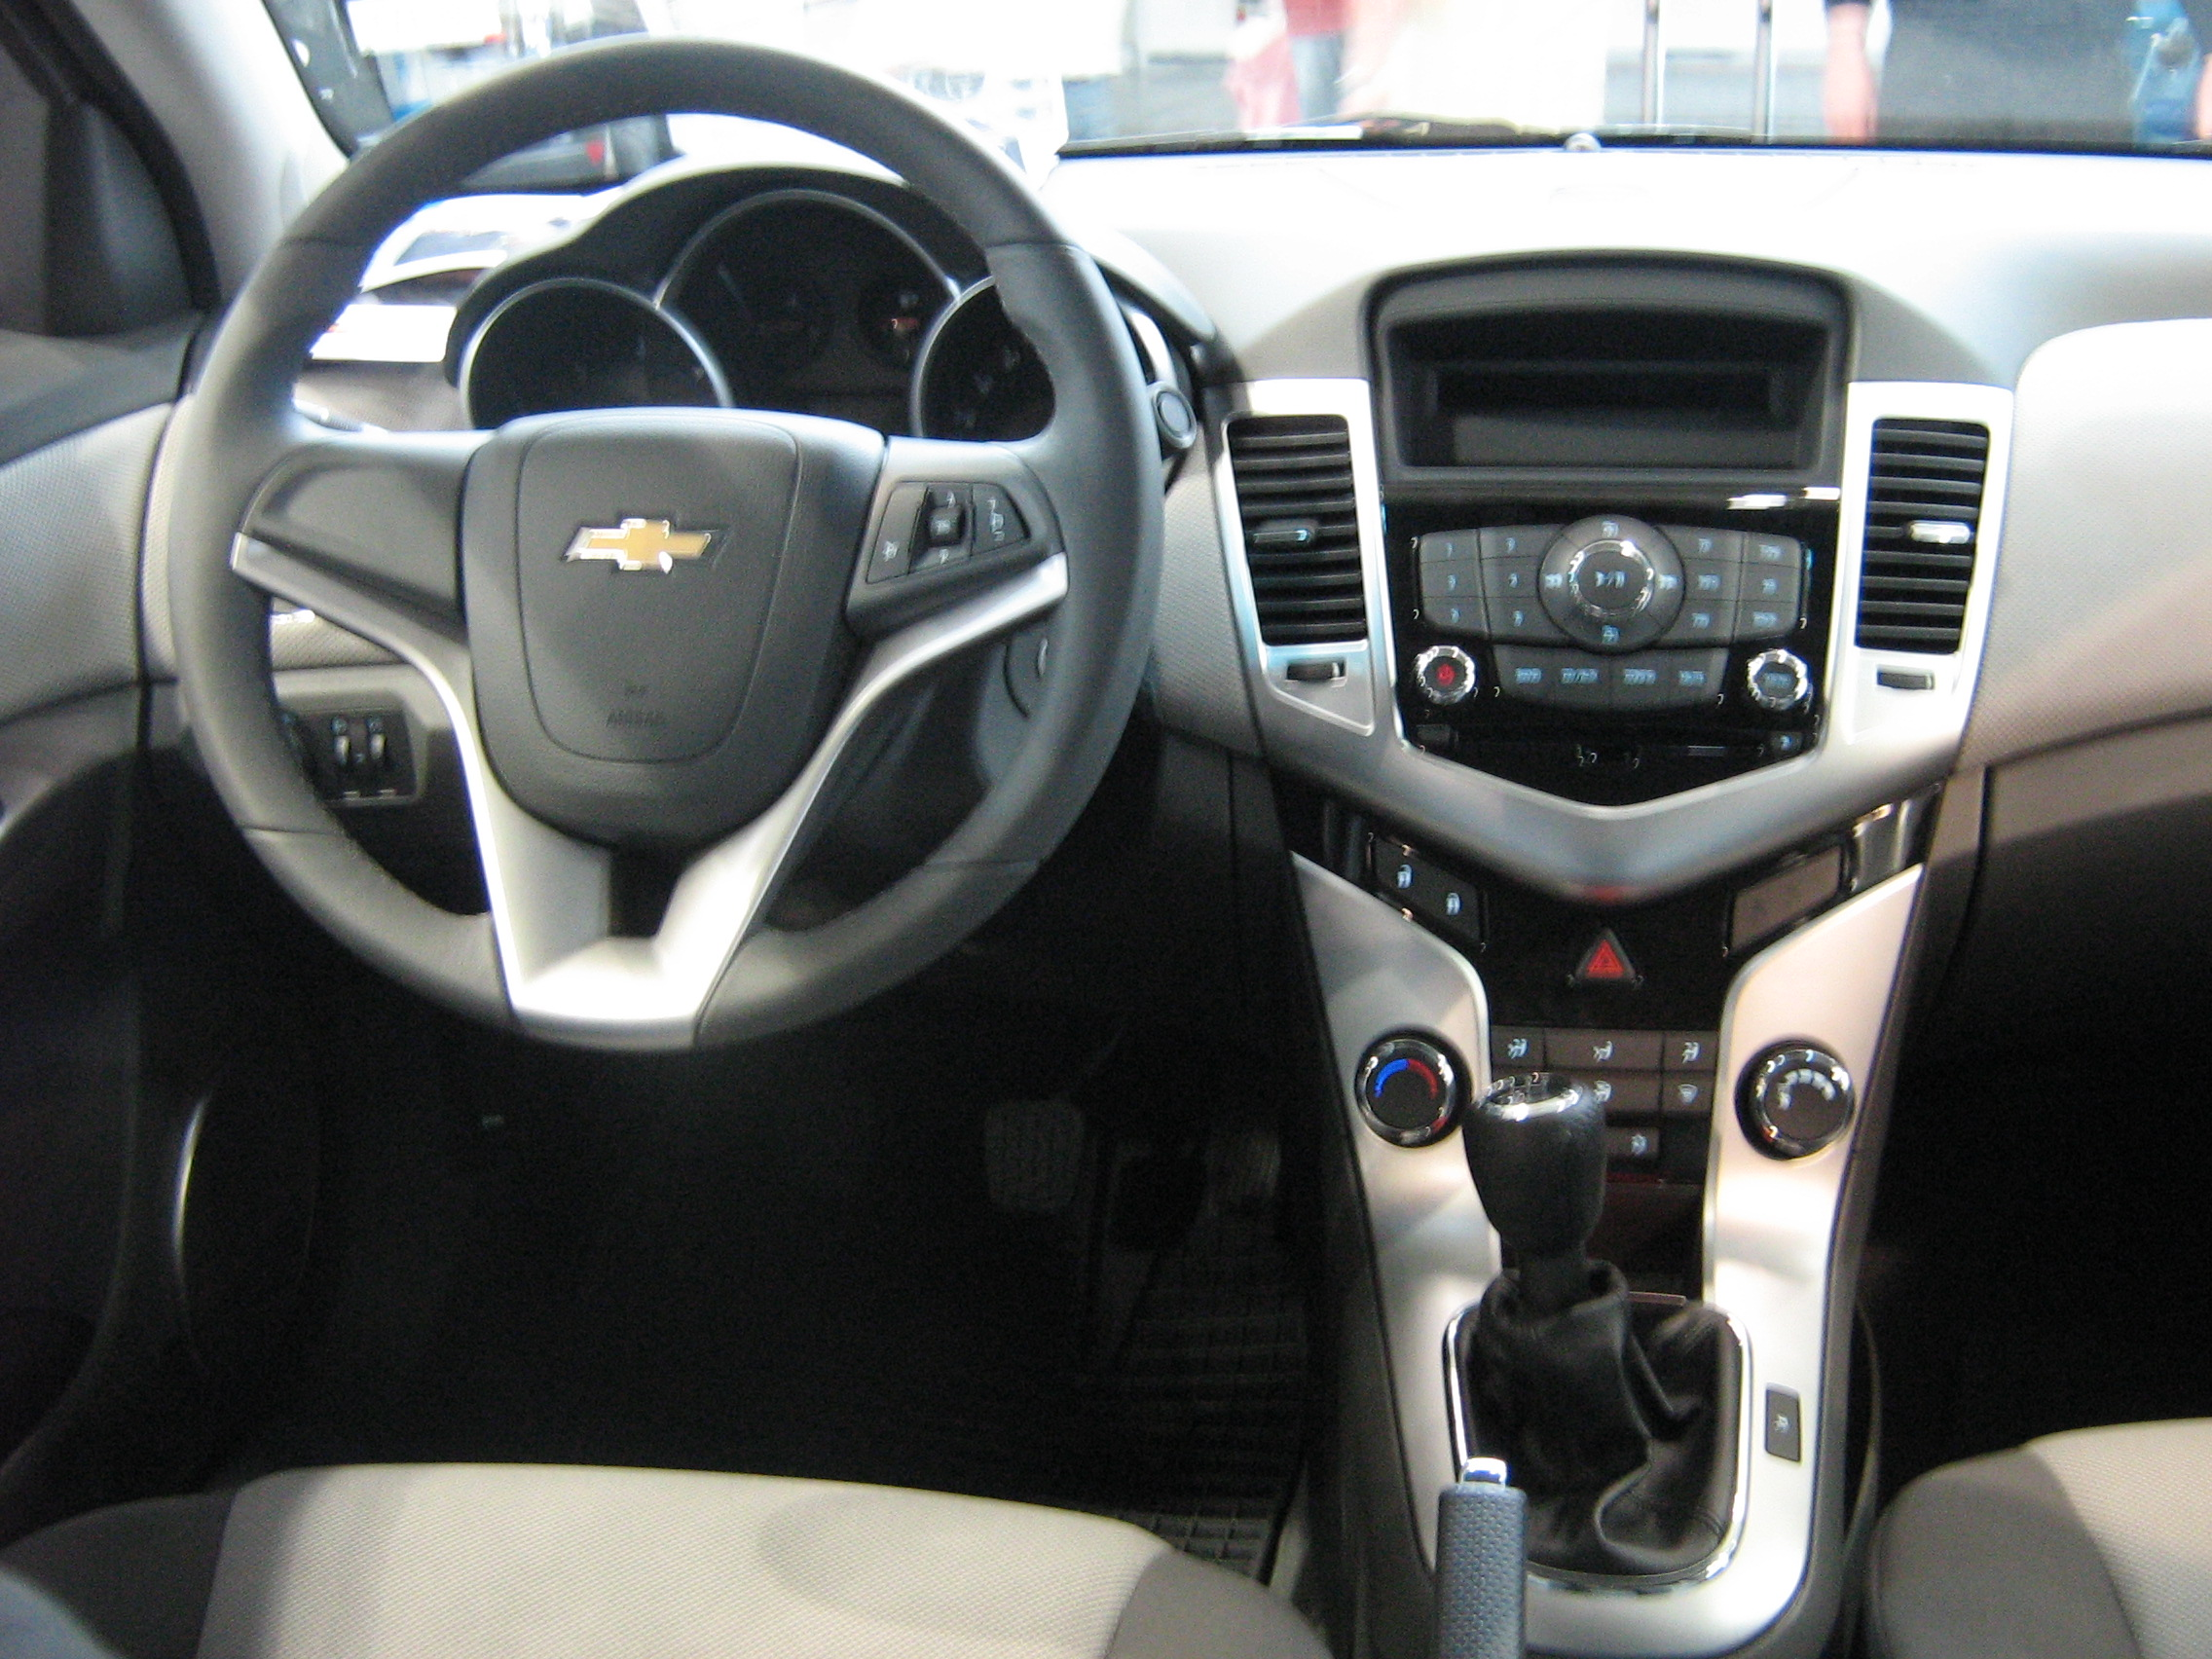 Chevrolet Cruze - это... Что такое Chevrolet Cruze?